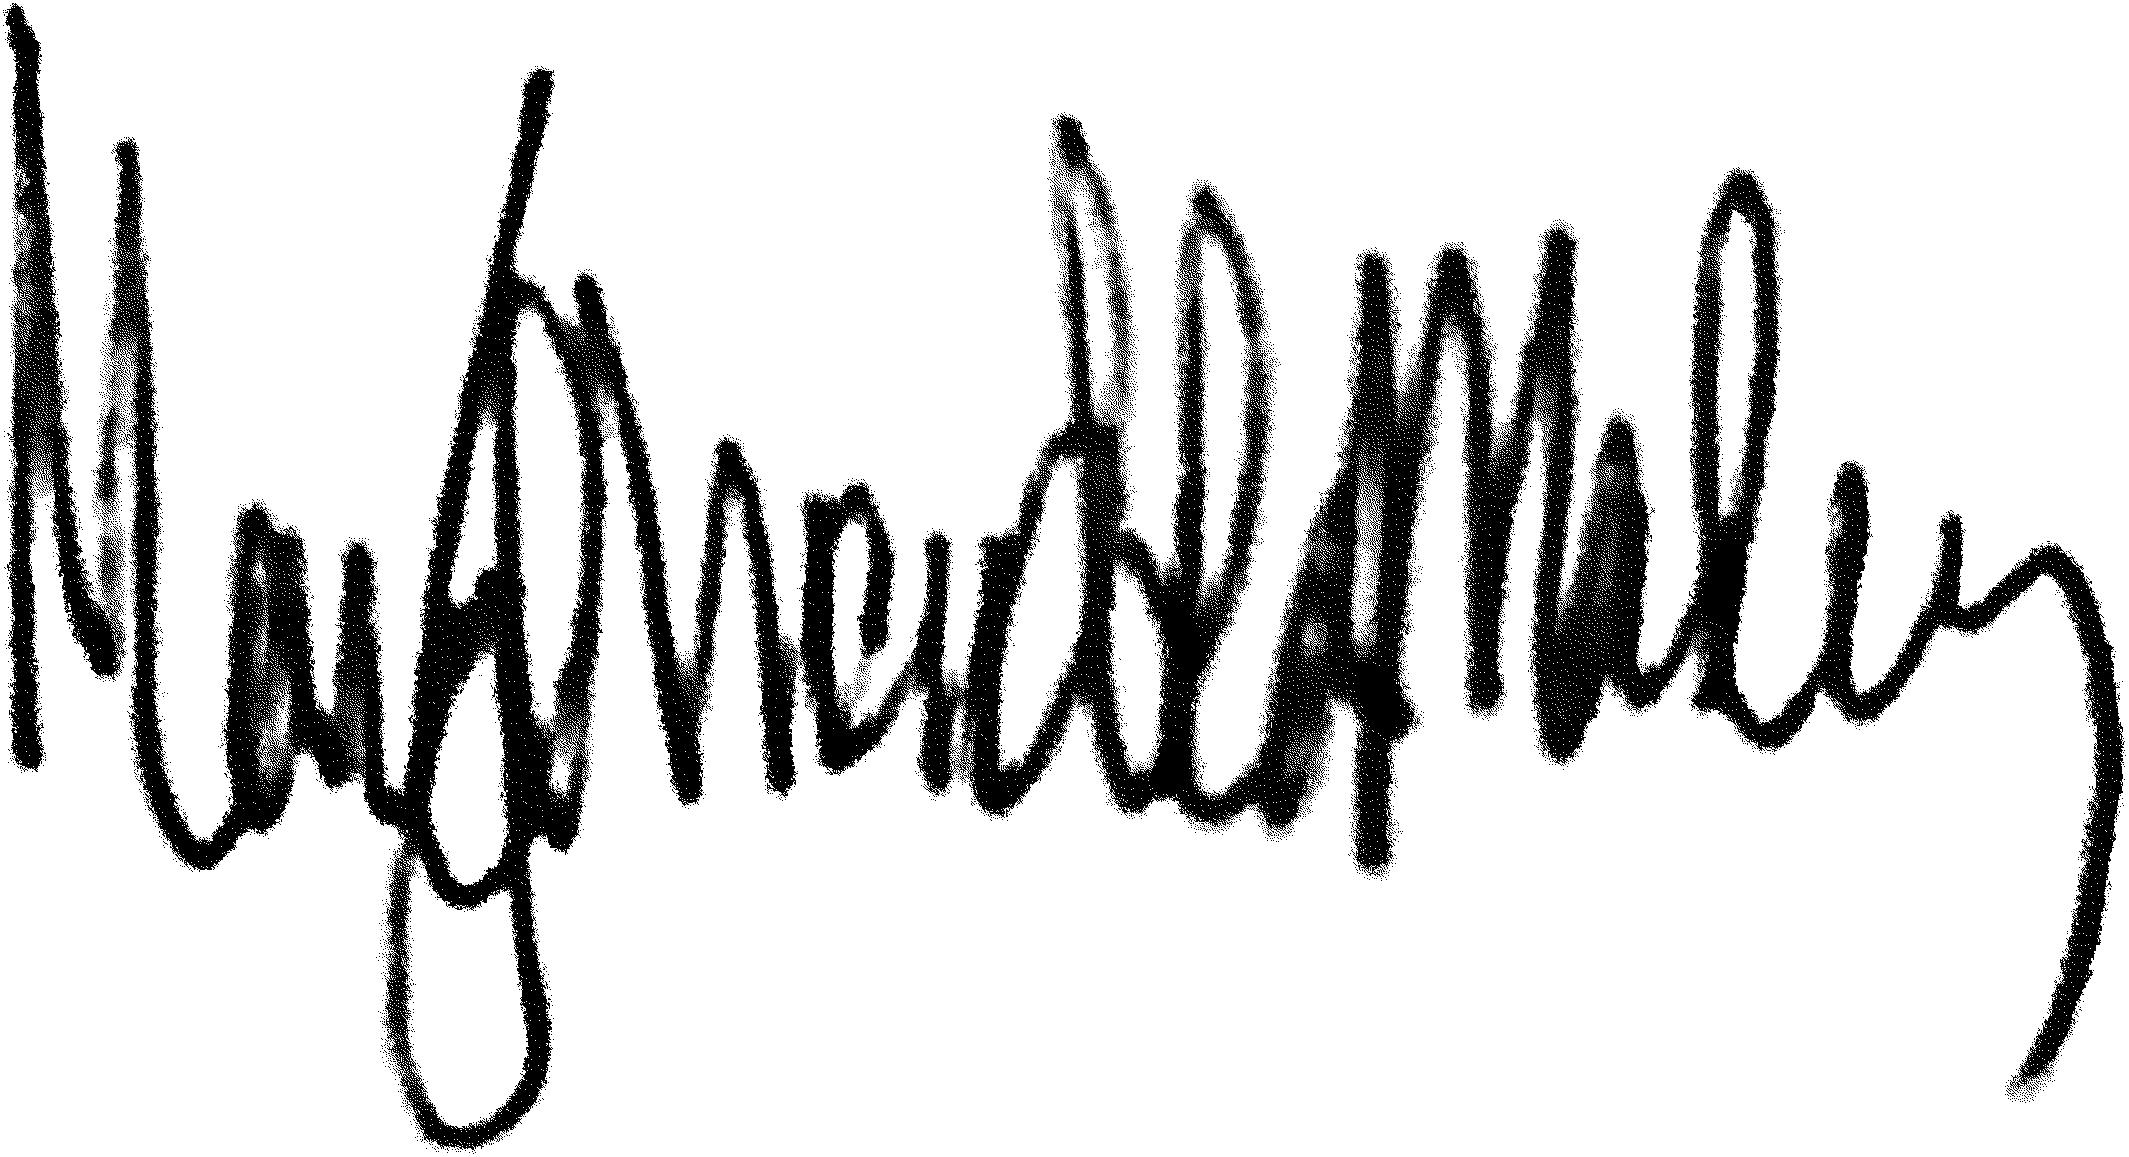 memarley57's Signature